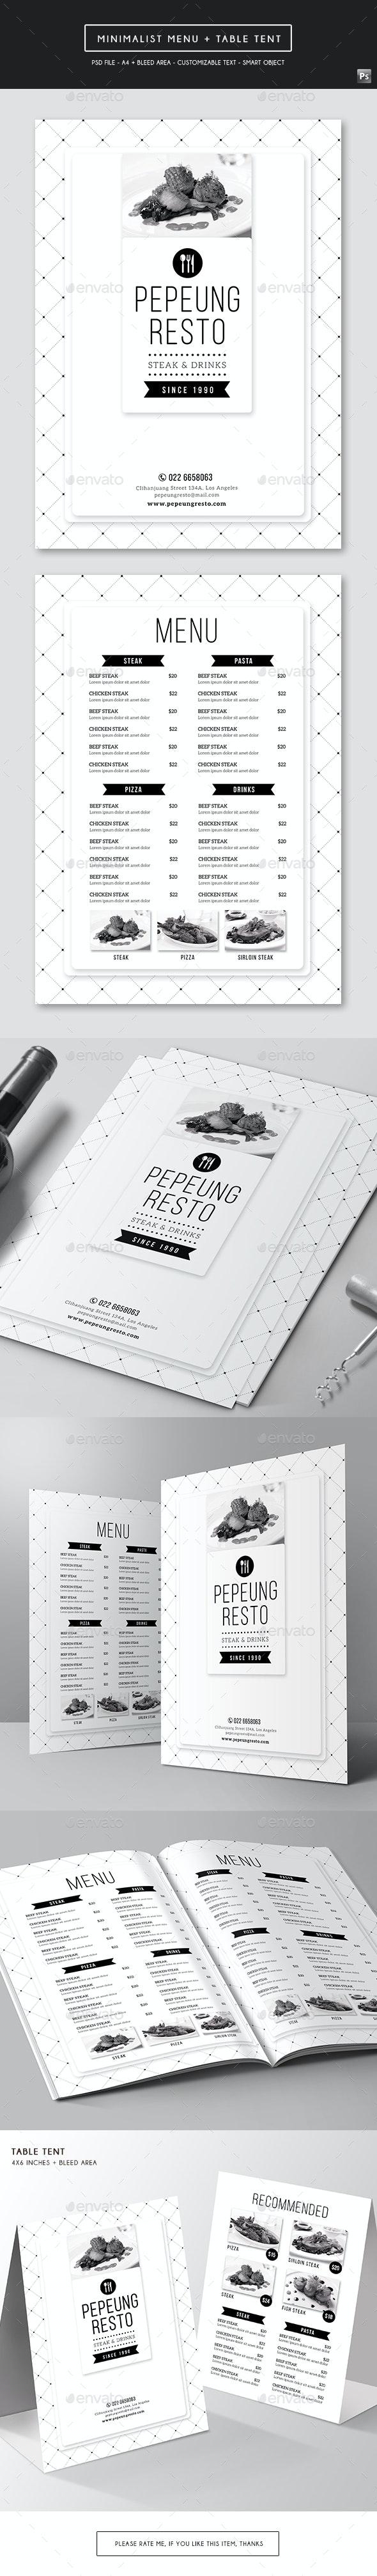 Minimalist Menu + Table Tent - Food Menus Print Templates